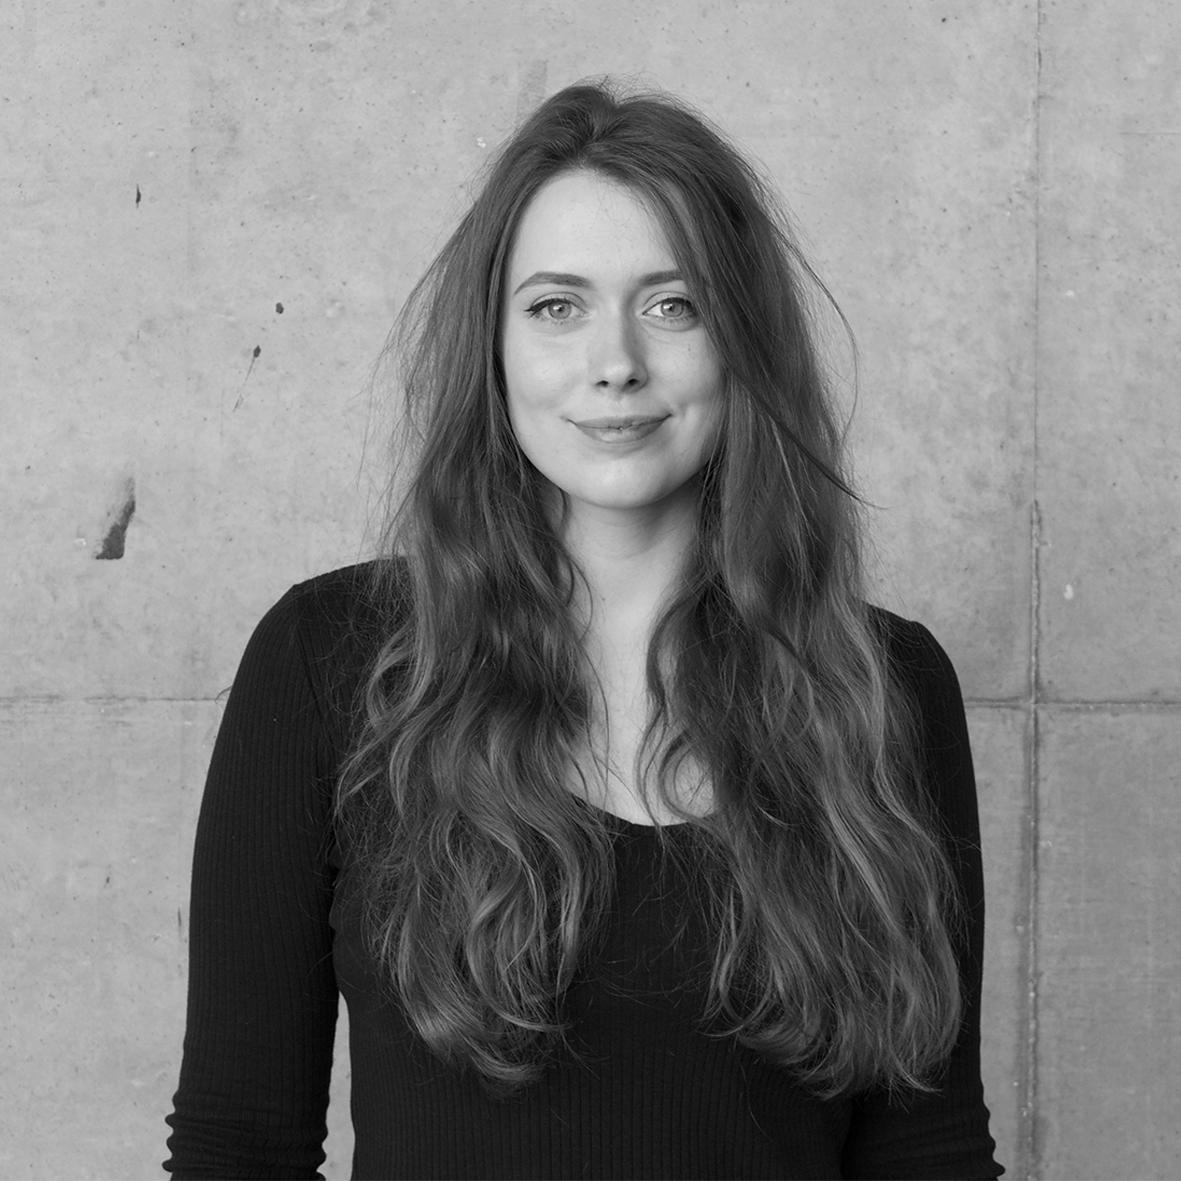 Lena Peters